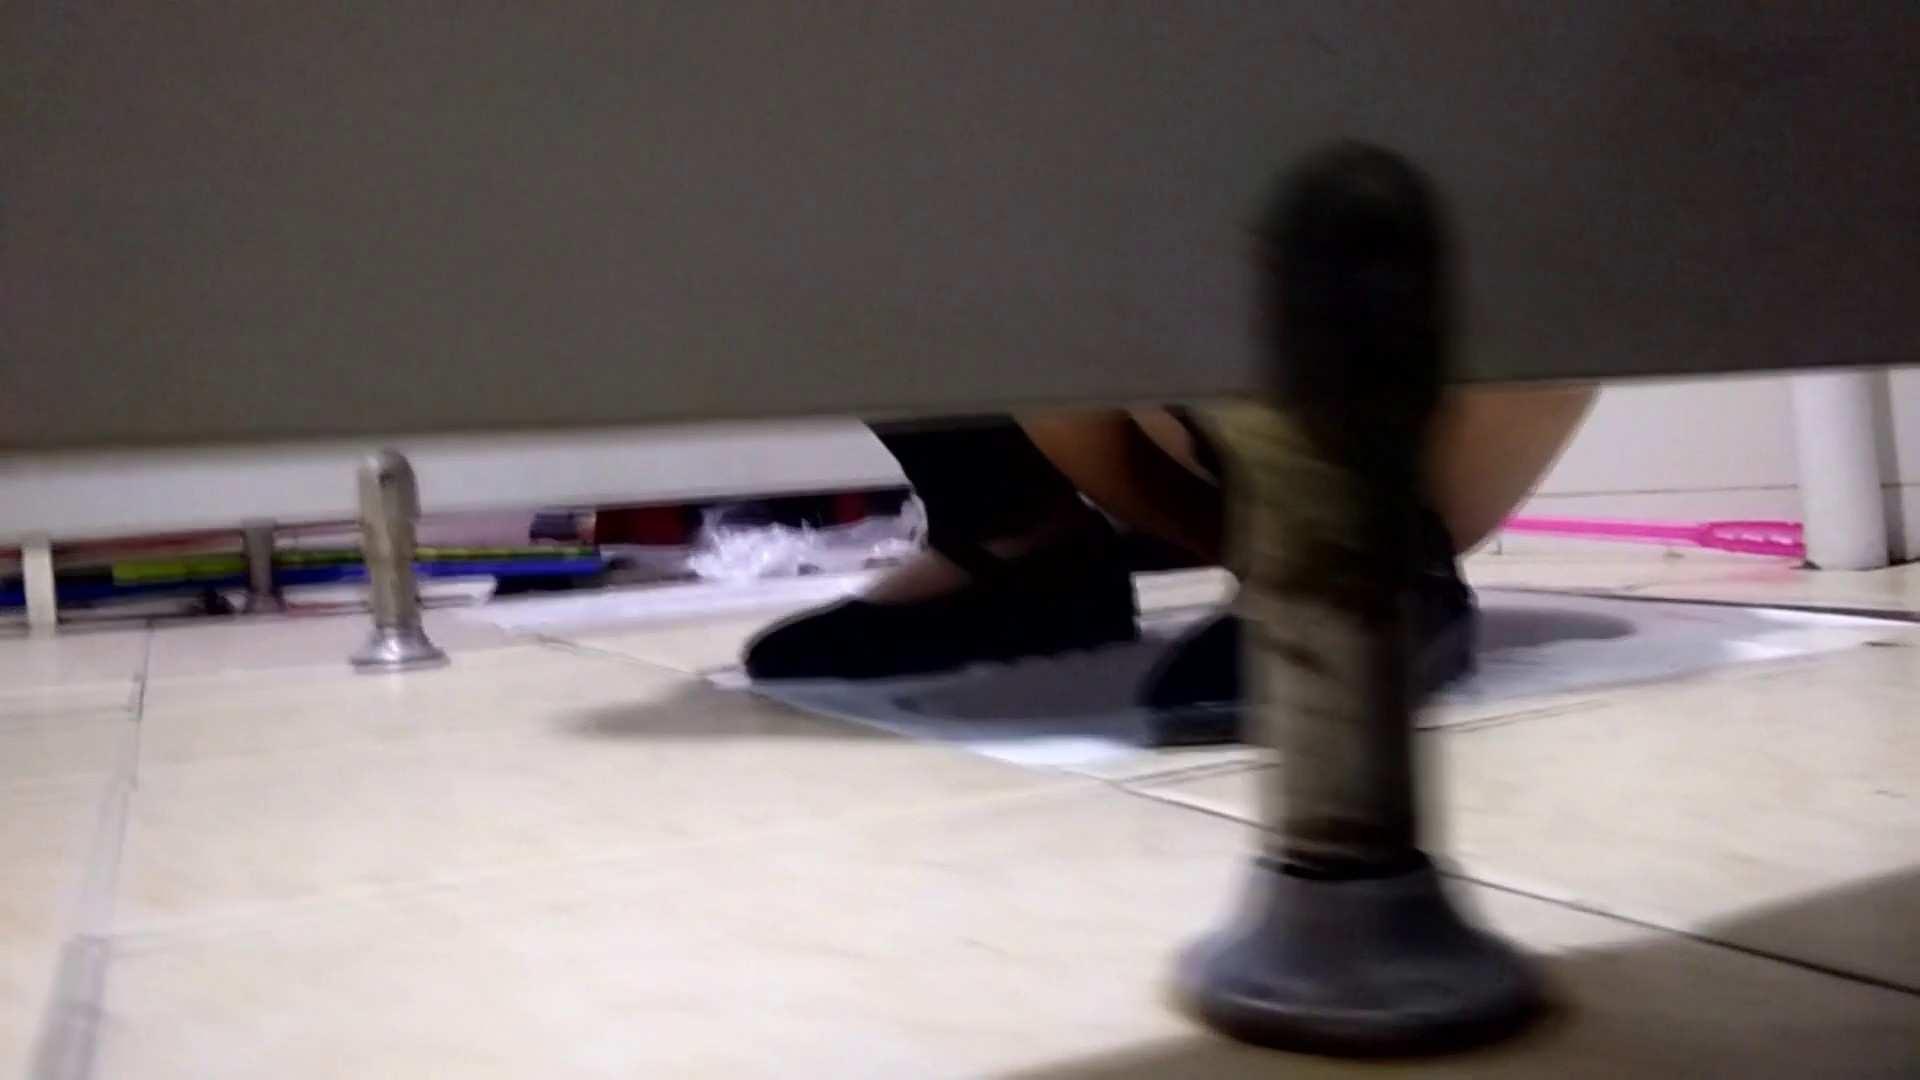 芸術大学ガチ潜入盗撮 JD盗撮 美女の洗面所の秘密 Vol.105 トイレ中の女子達 濡れ場動画紹介 83連発 29